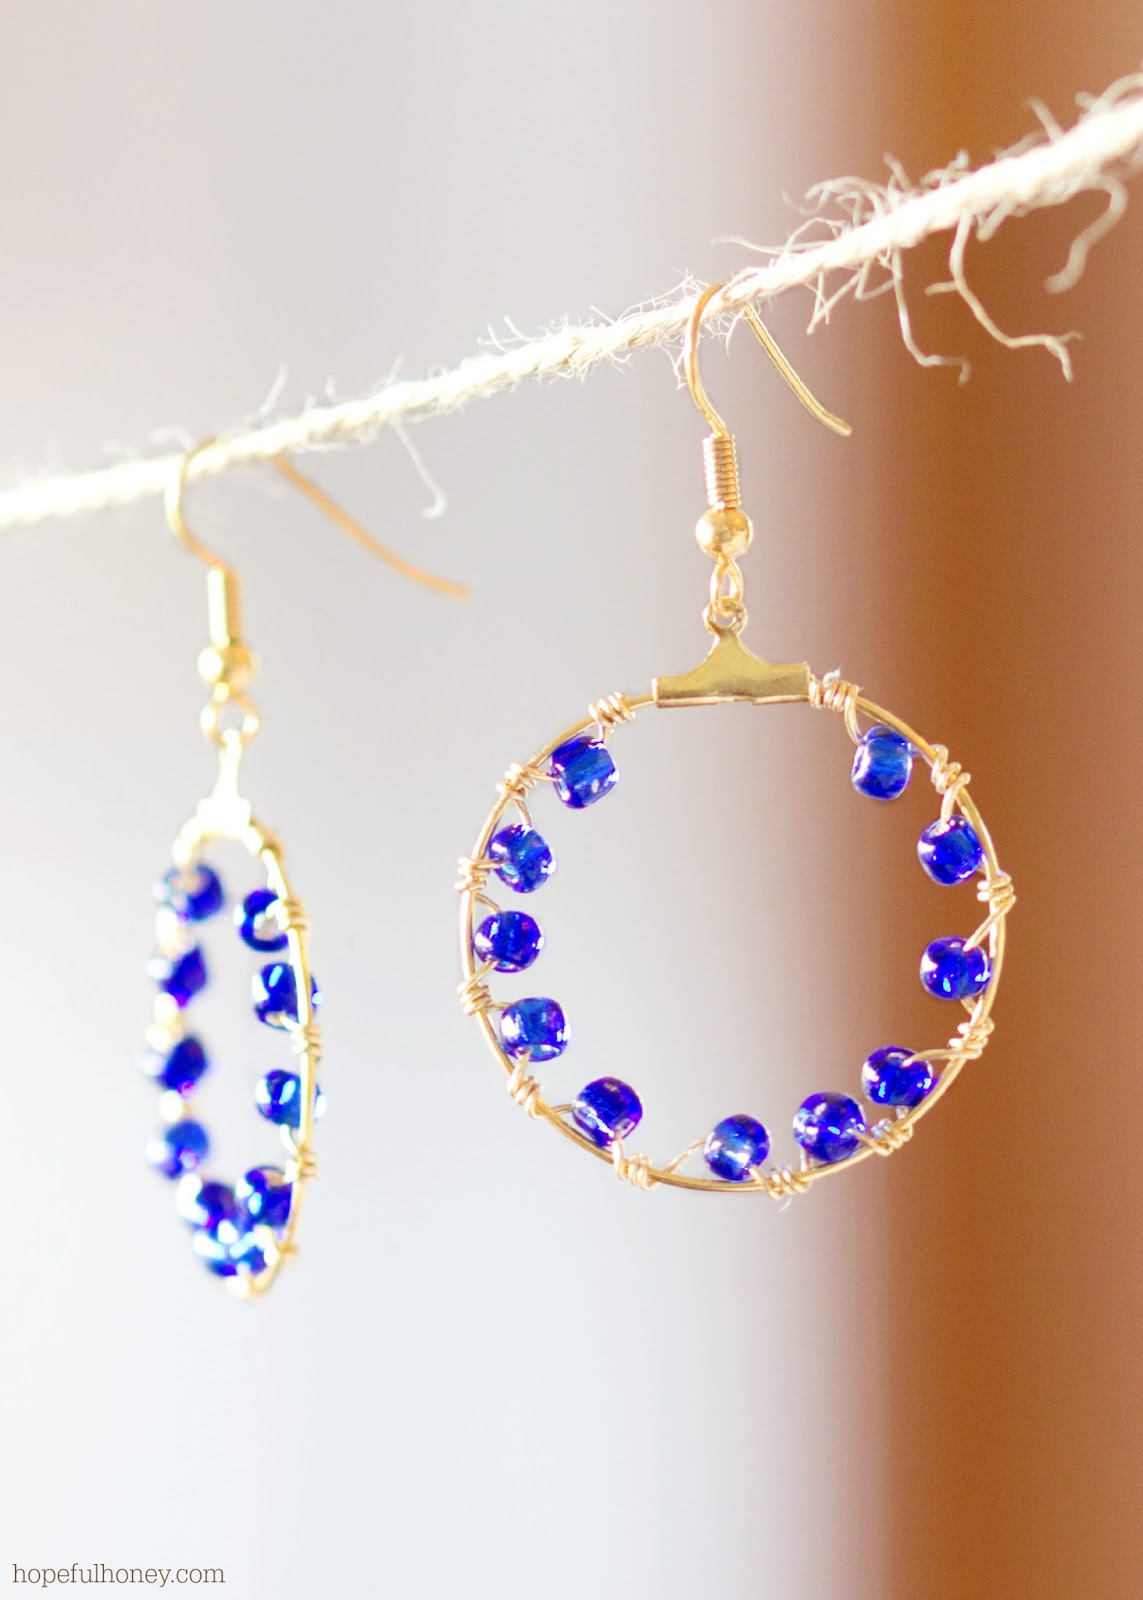 http://2.bp.blogspot.com/-JSb_t6iP9Uw/U4mpg-SlsoI/AAAAAAAAKS4/W6Crx12CIAs/s1600/DIY+Salacia+Hoop+Earrings+6.jpg